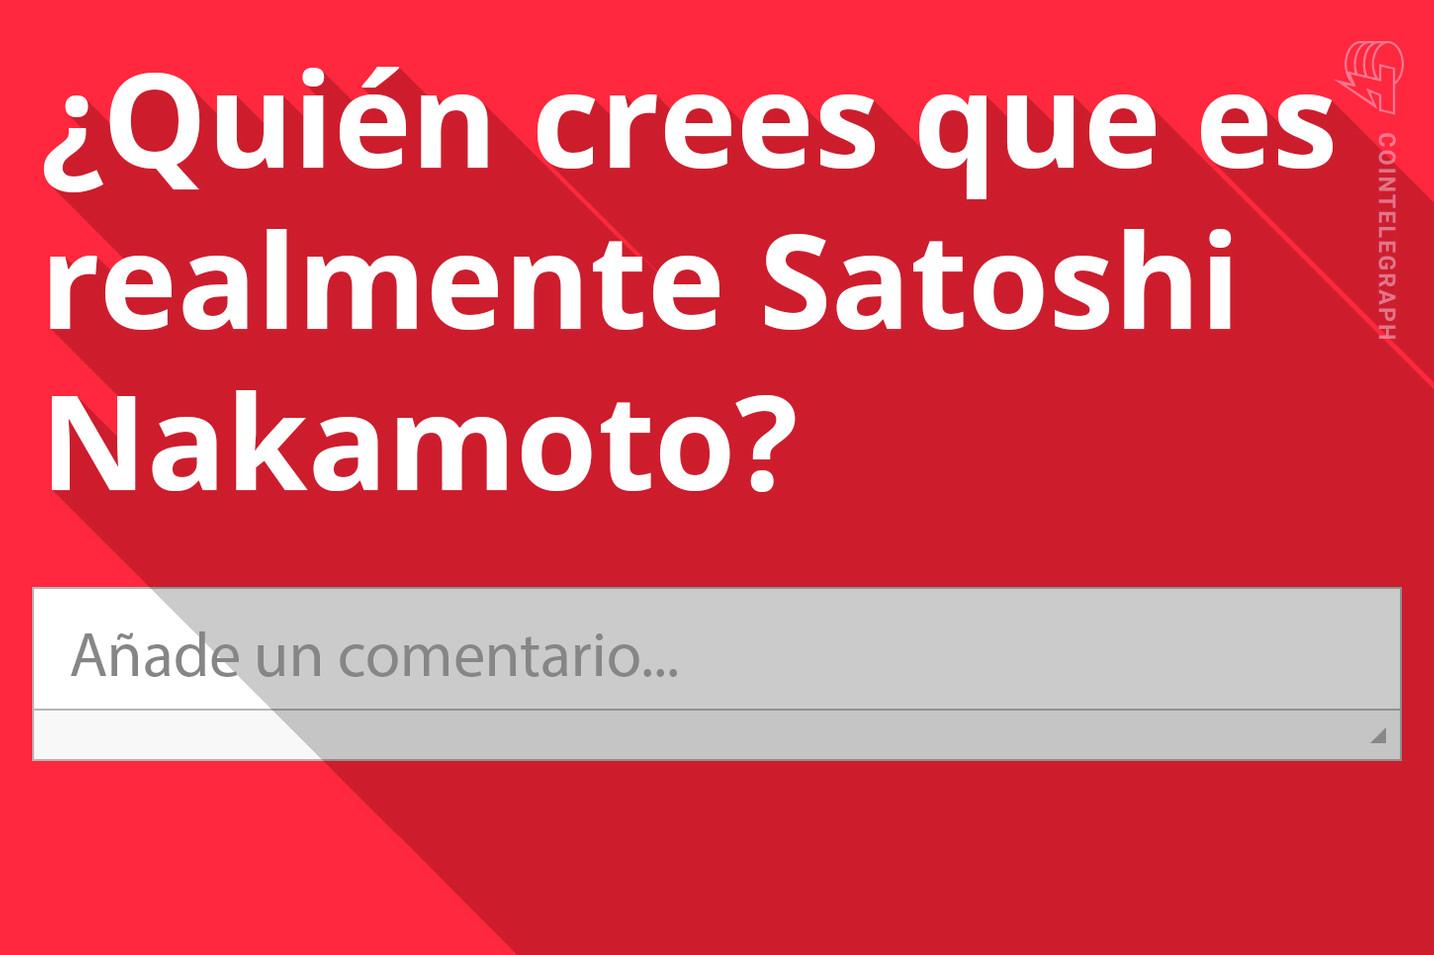 Exprésate: ¿Quién crees que es realmente Satoshi Nakamoto?